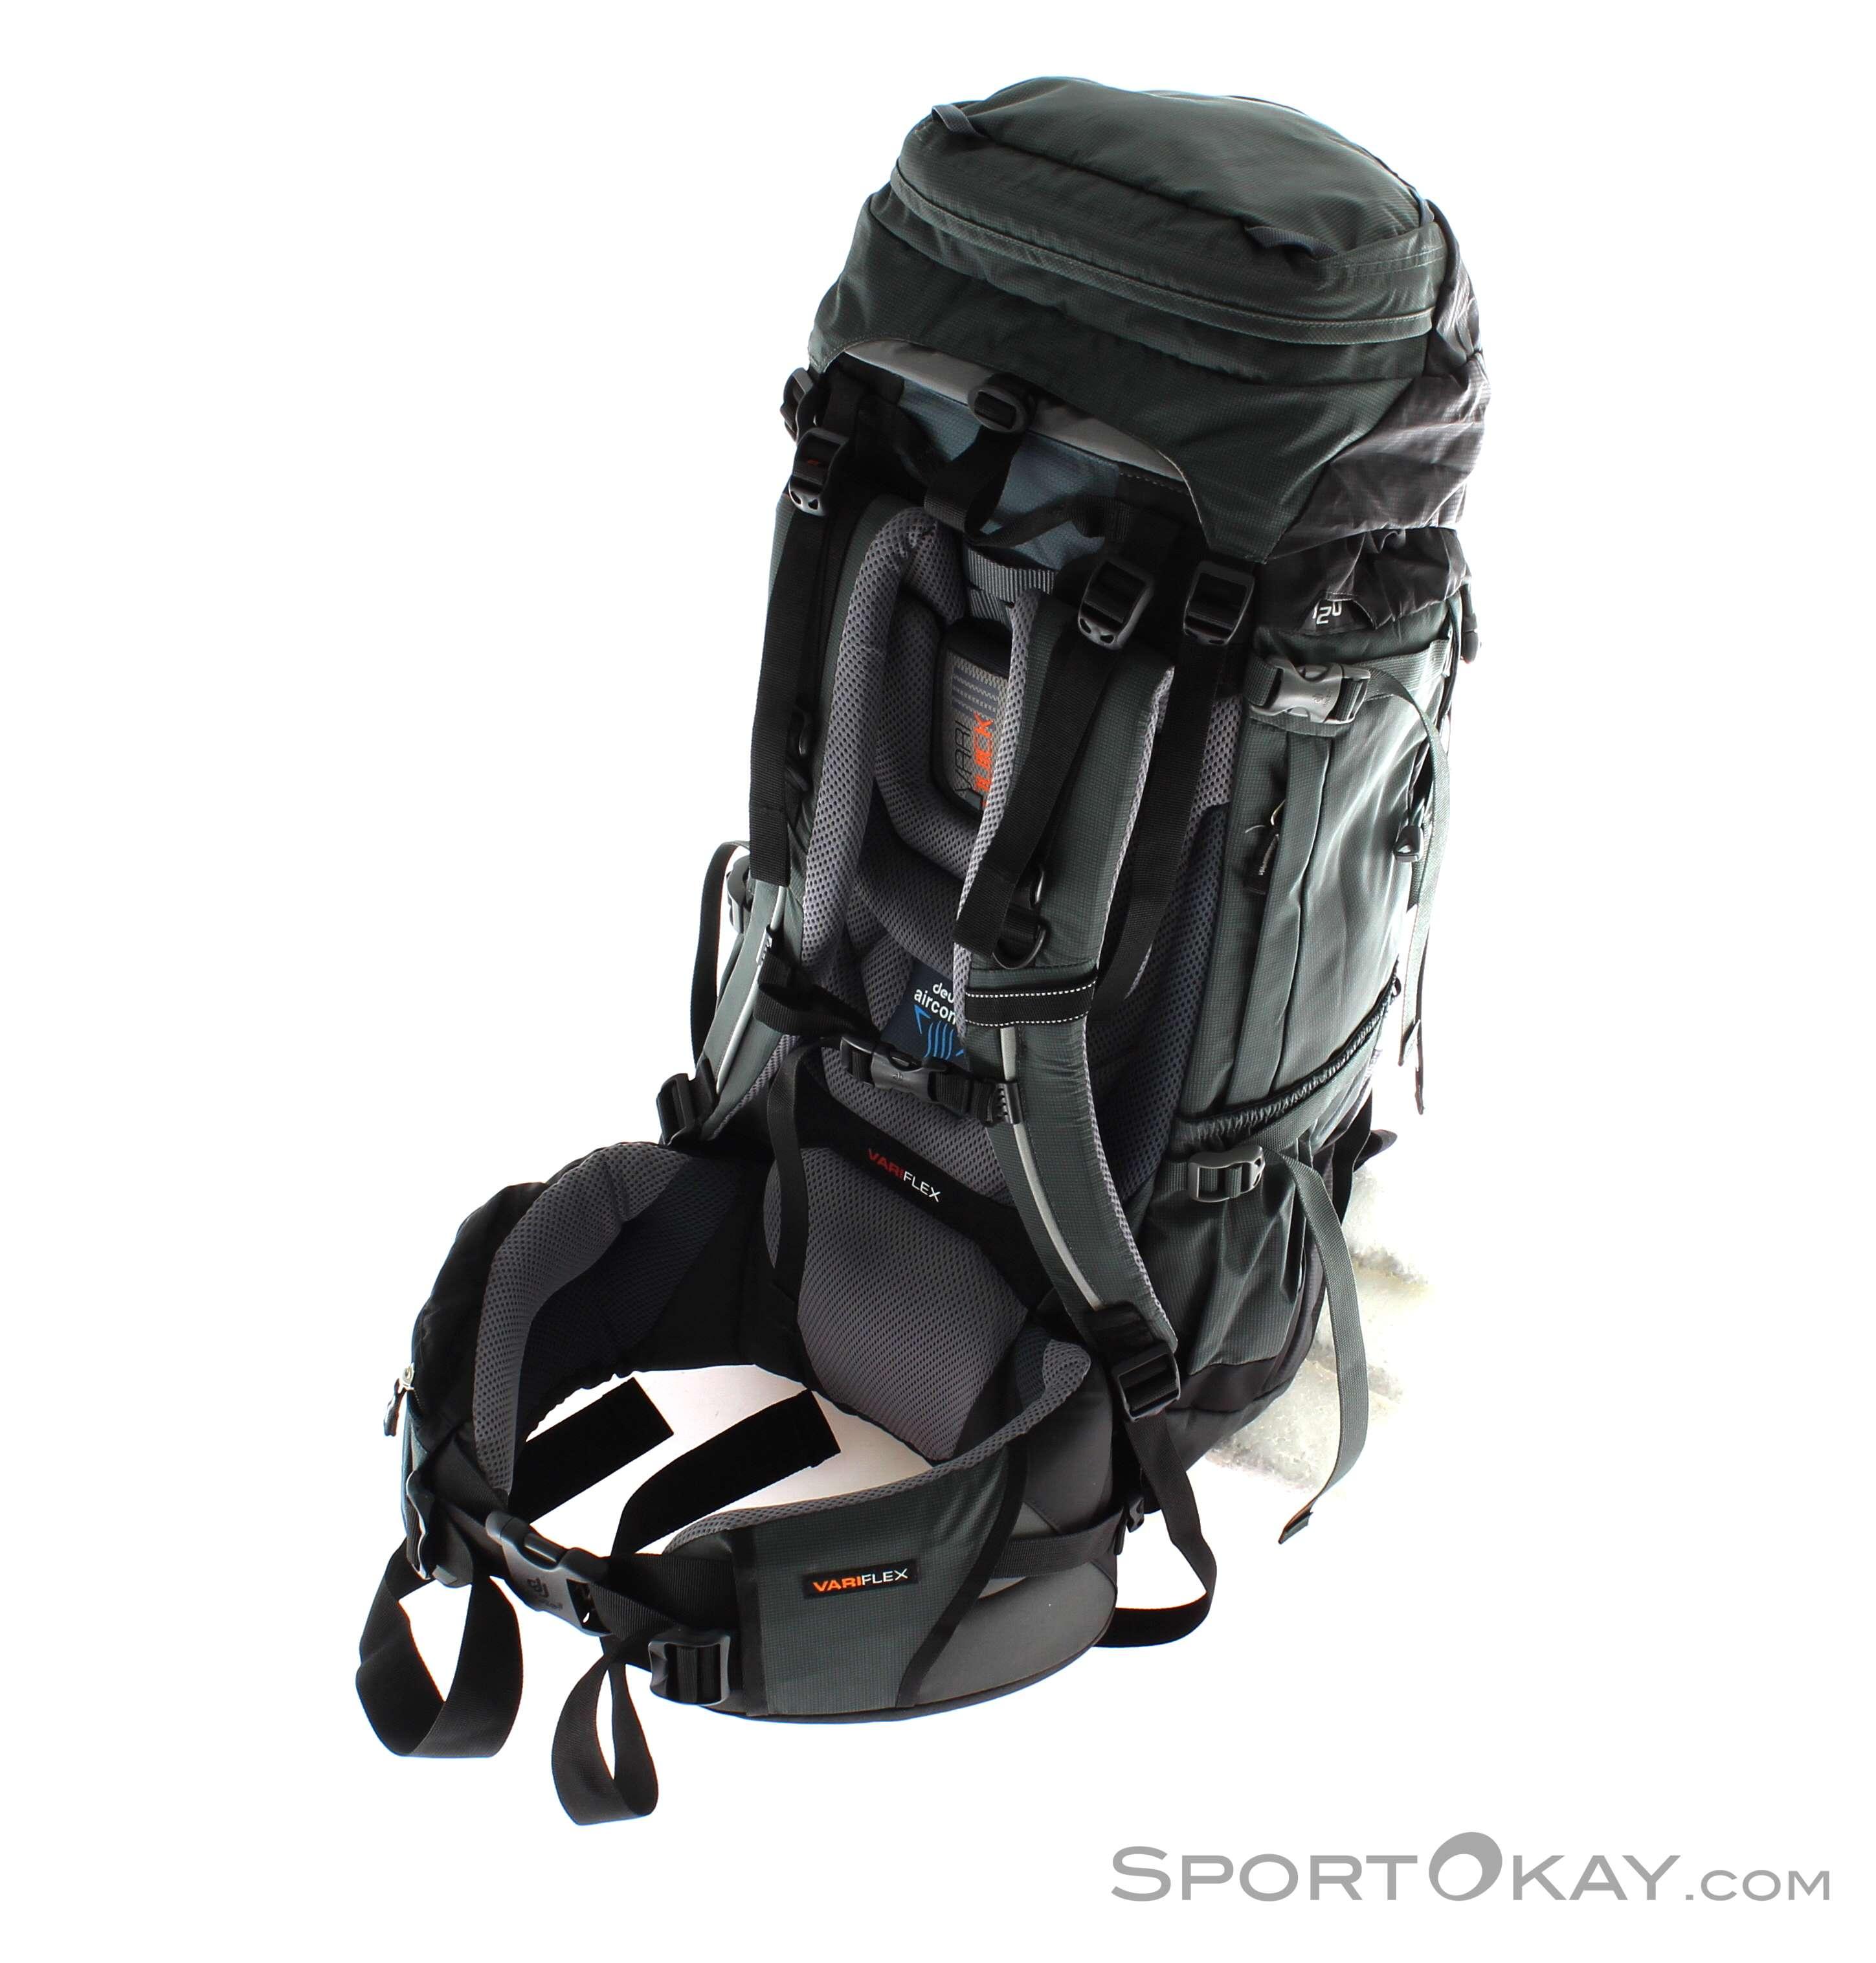 deuter aircontact 45 10l backpack backpacks backpacks headlamps outdoor all. Black Bedroom Furniture Sets. Home Design Ideas